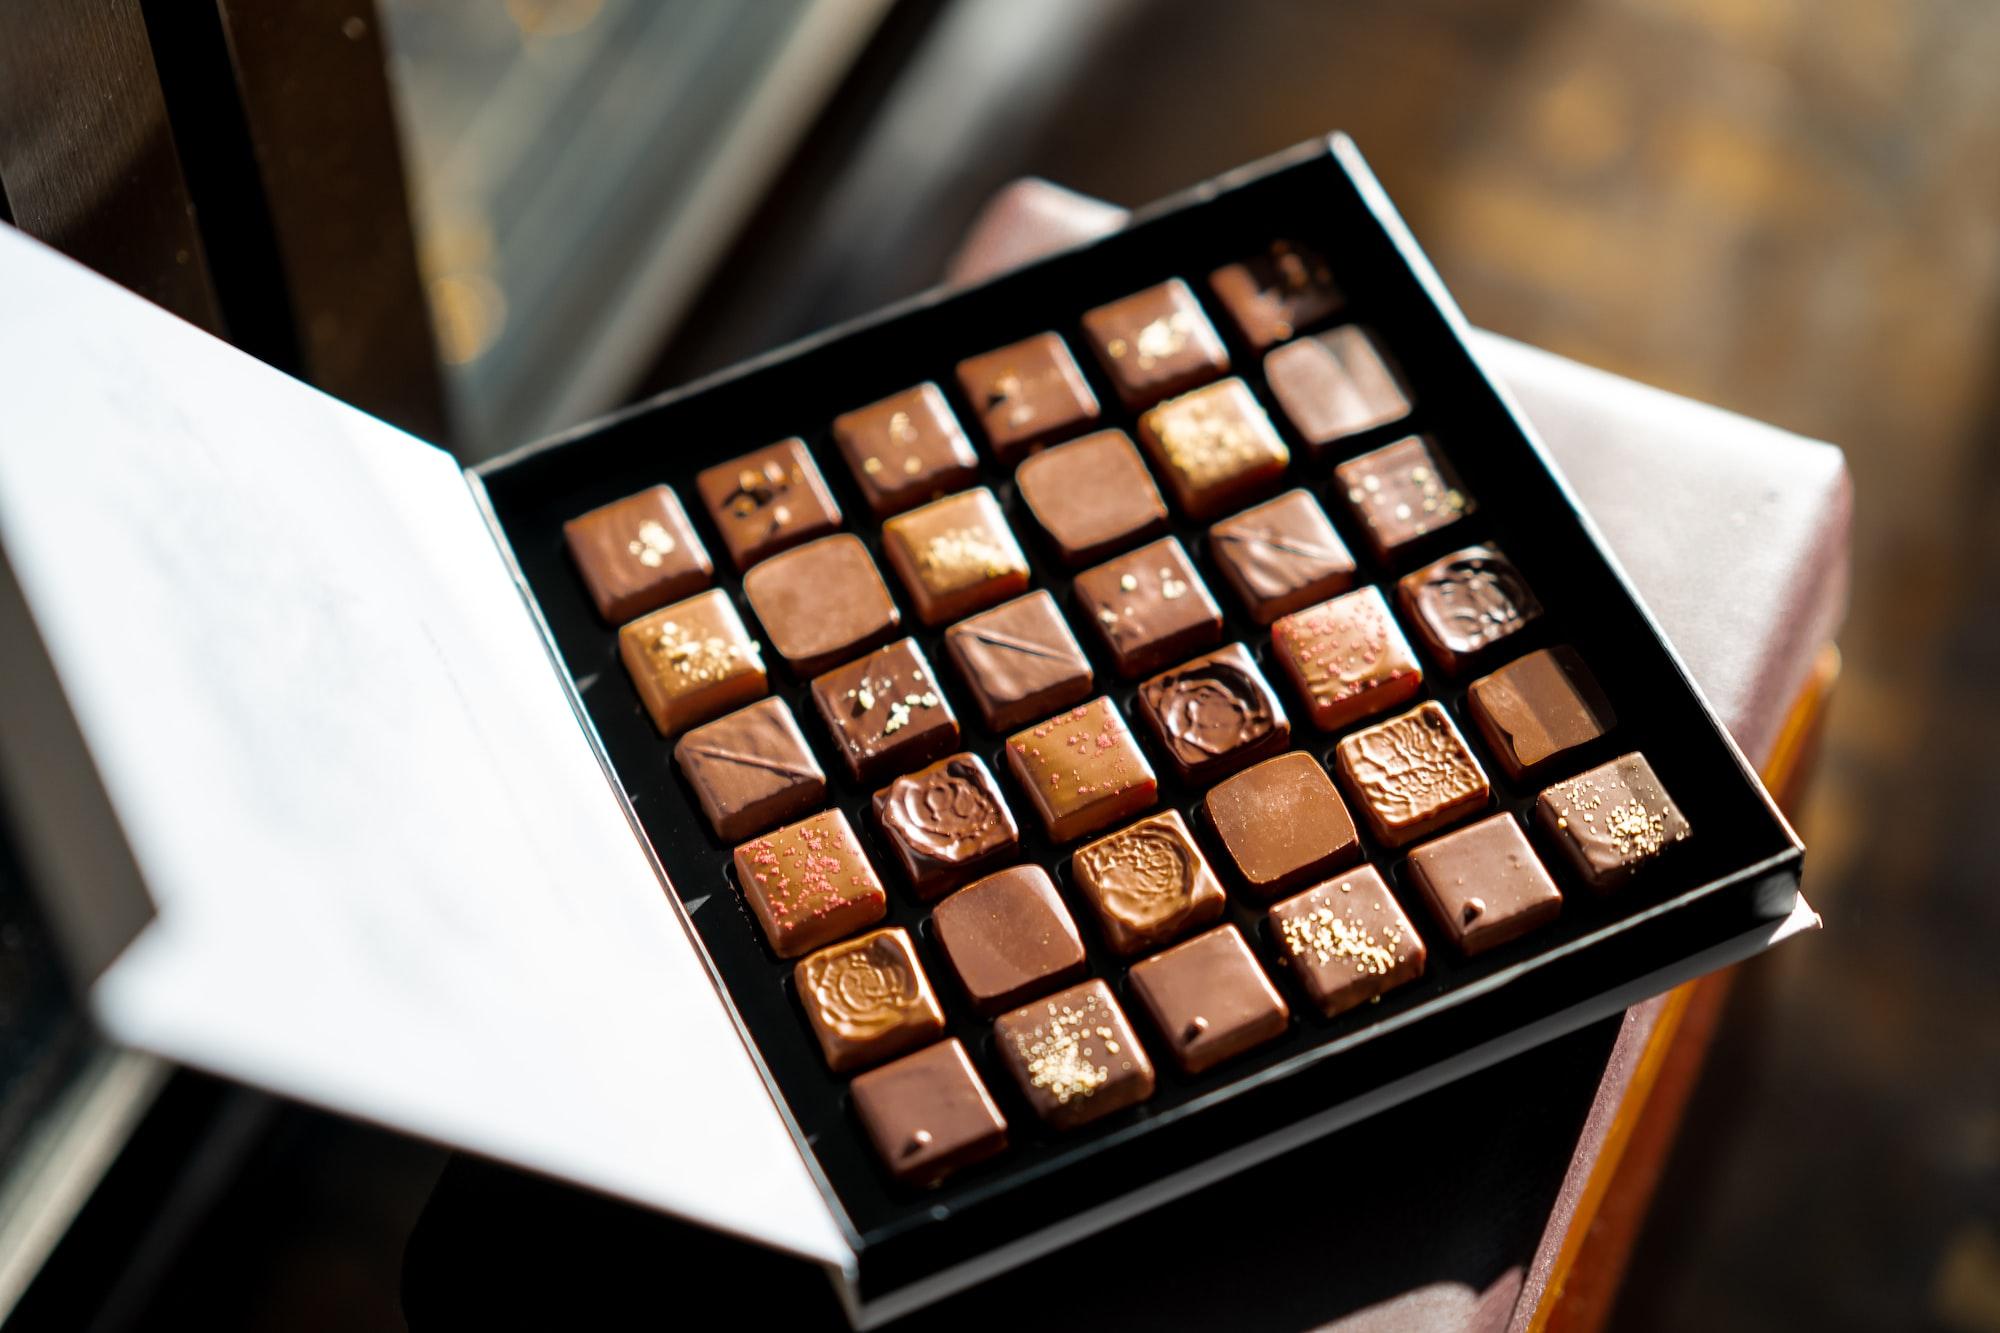 Chocolatey - Software Management for Windows